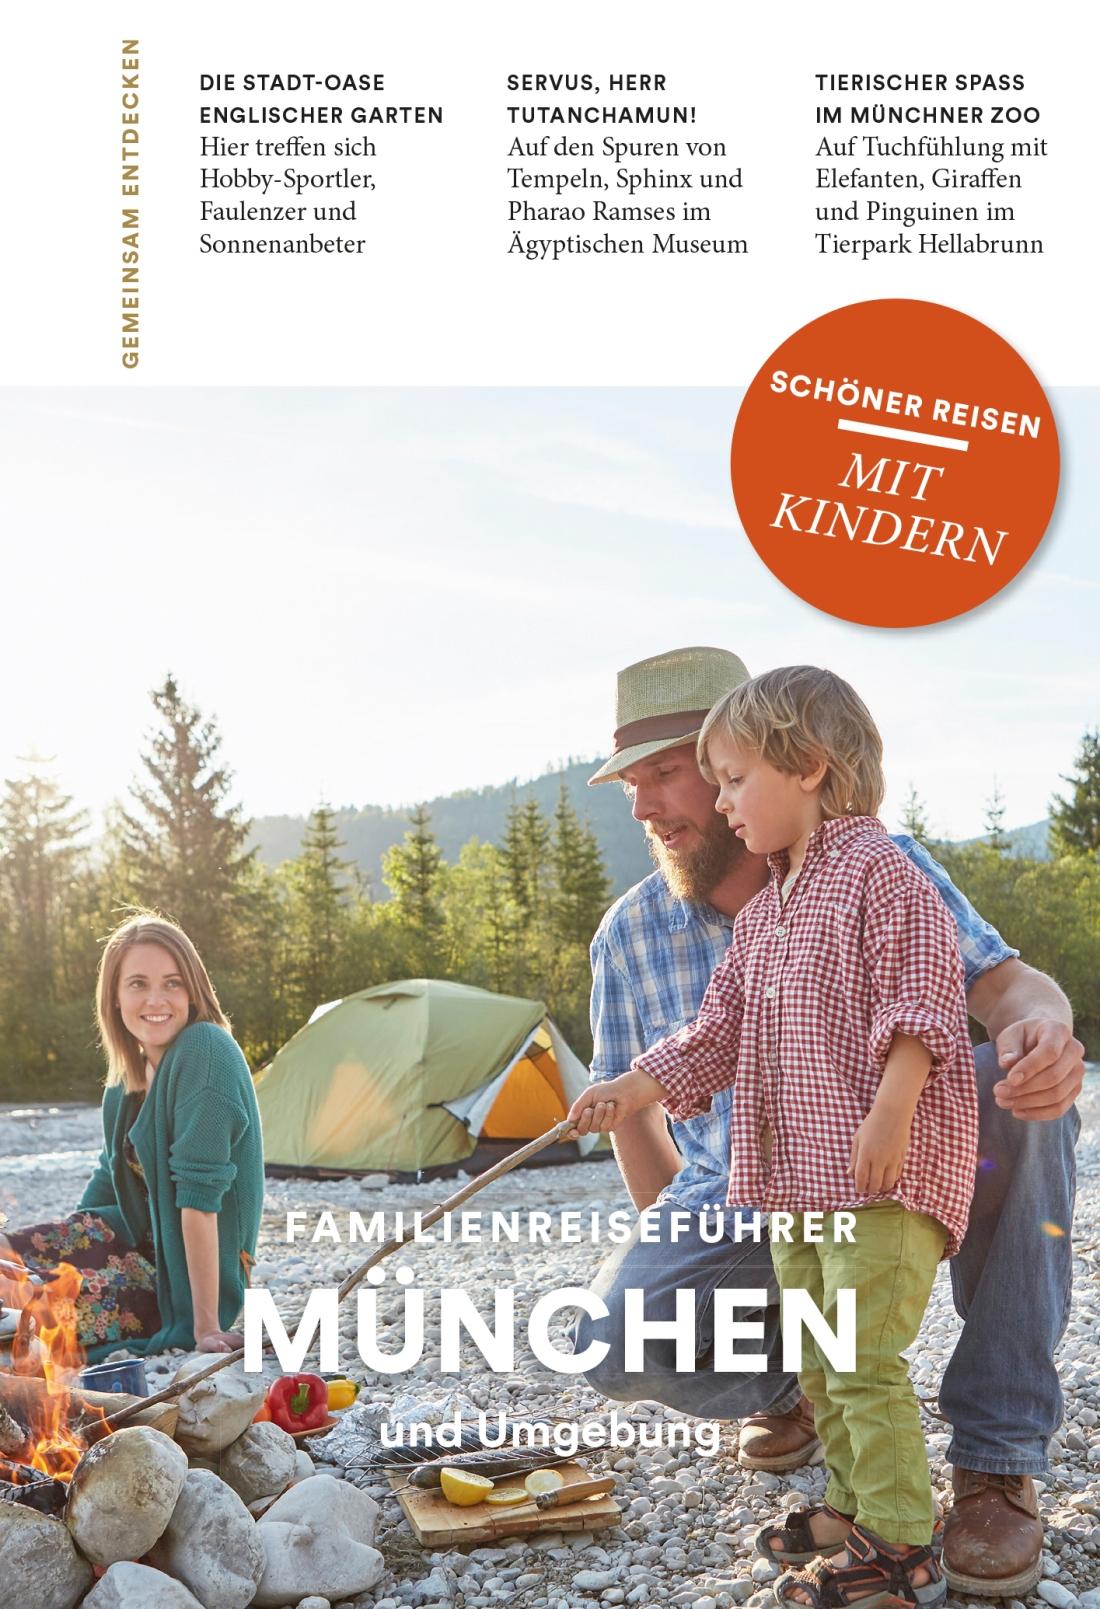 Muenchen_Umschlag_sp.indd